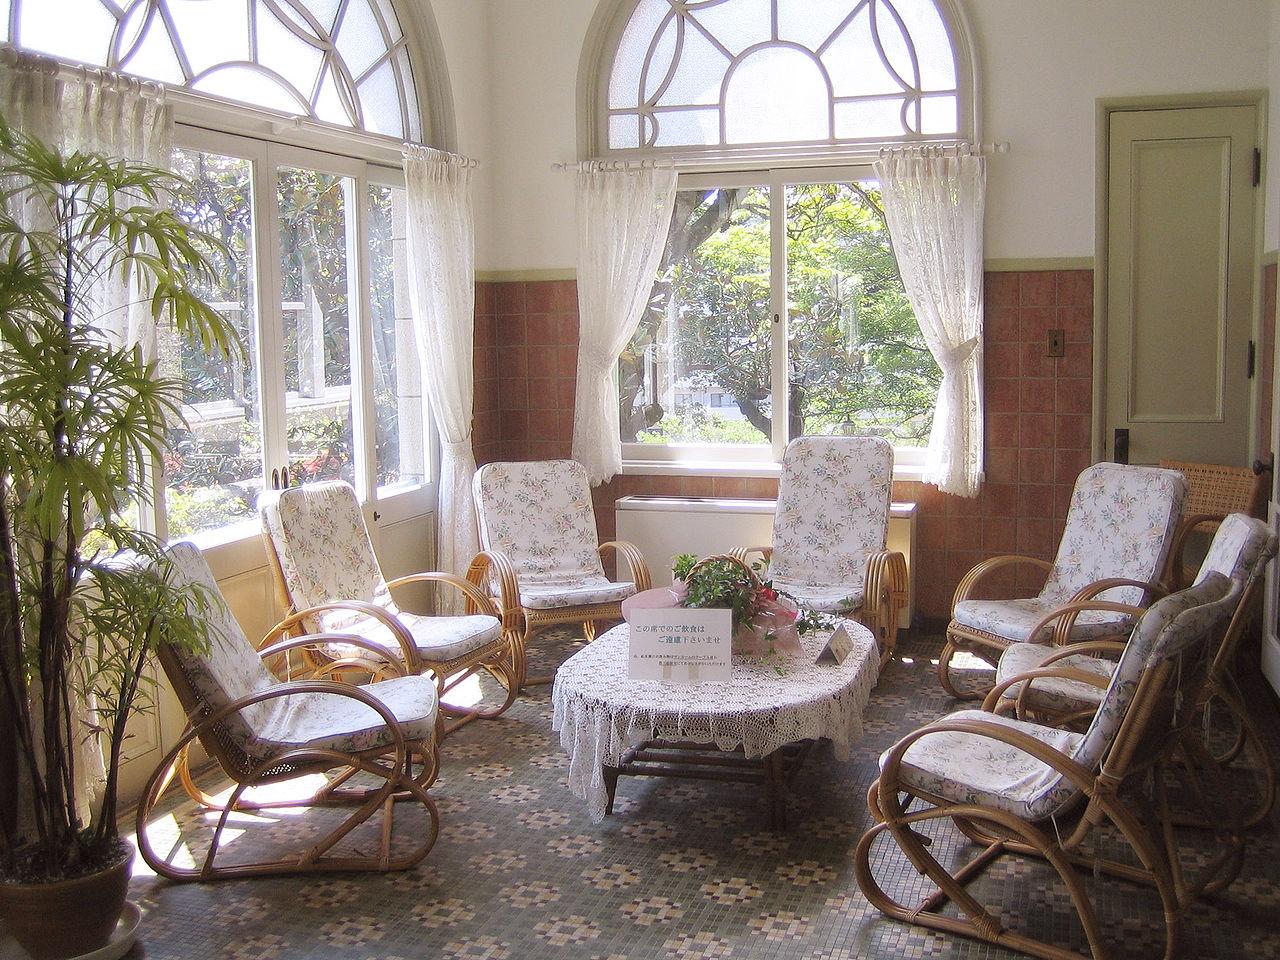 File:Hatoyama Hall (sun-room).jpg - Wikipedia